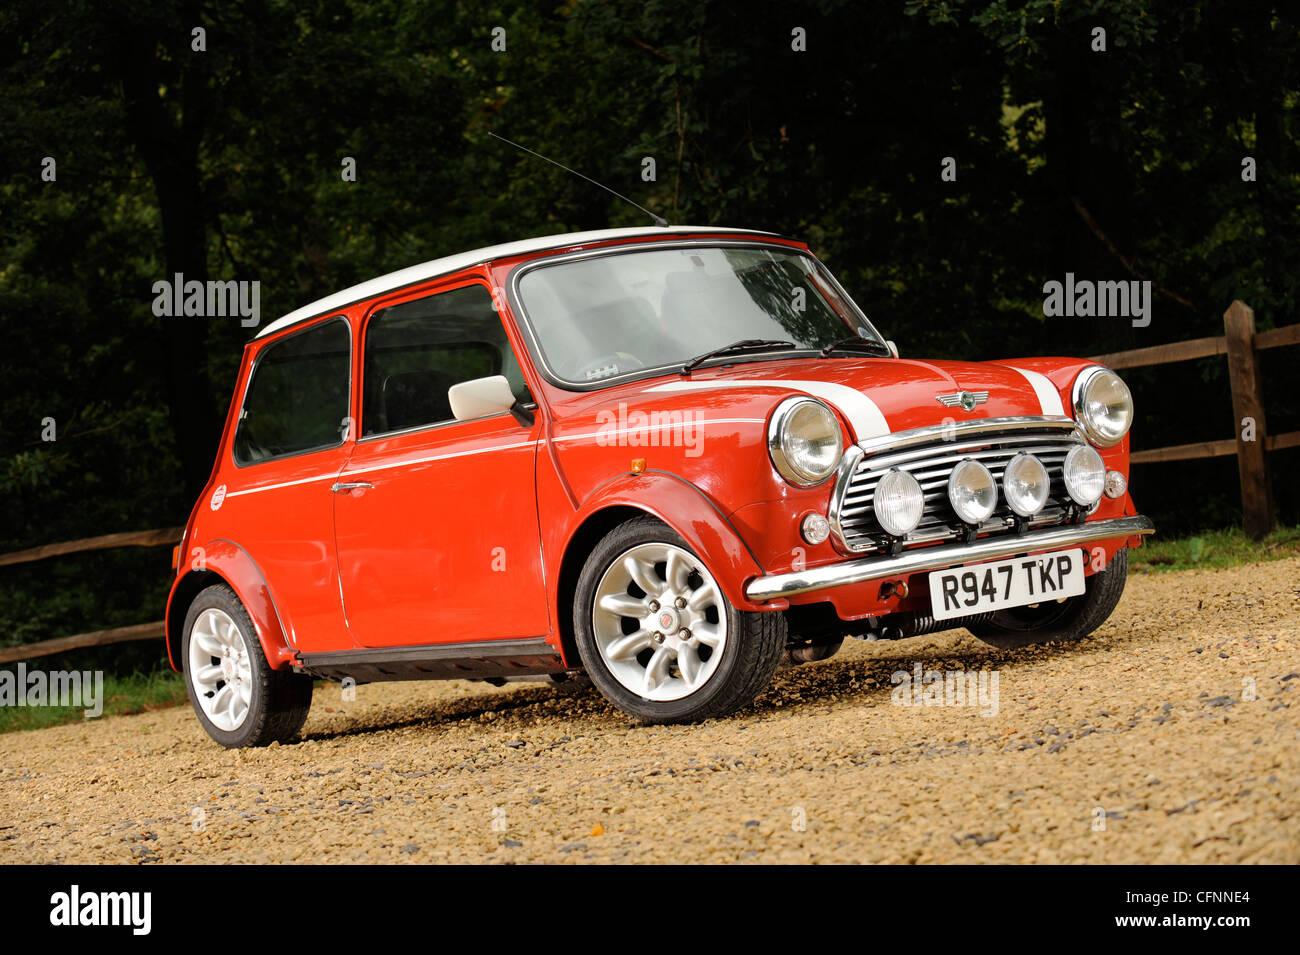 Rover Mini Cooper Car Stock Photos Rover Mini Cooper Car Stock